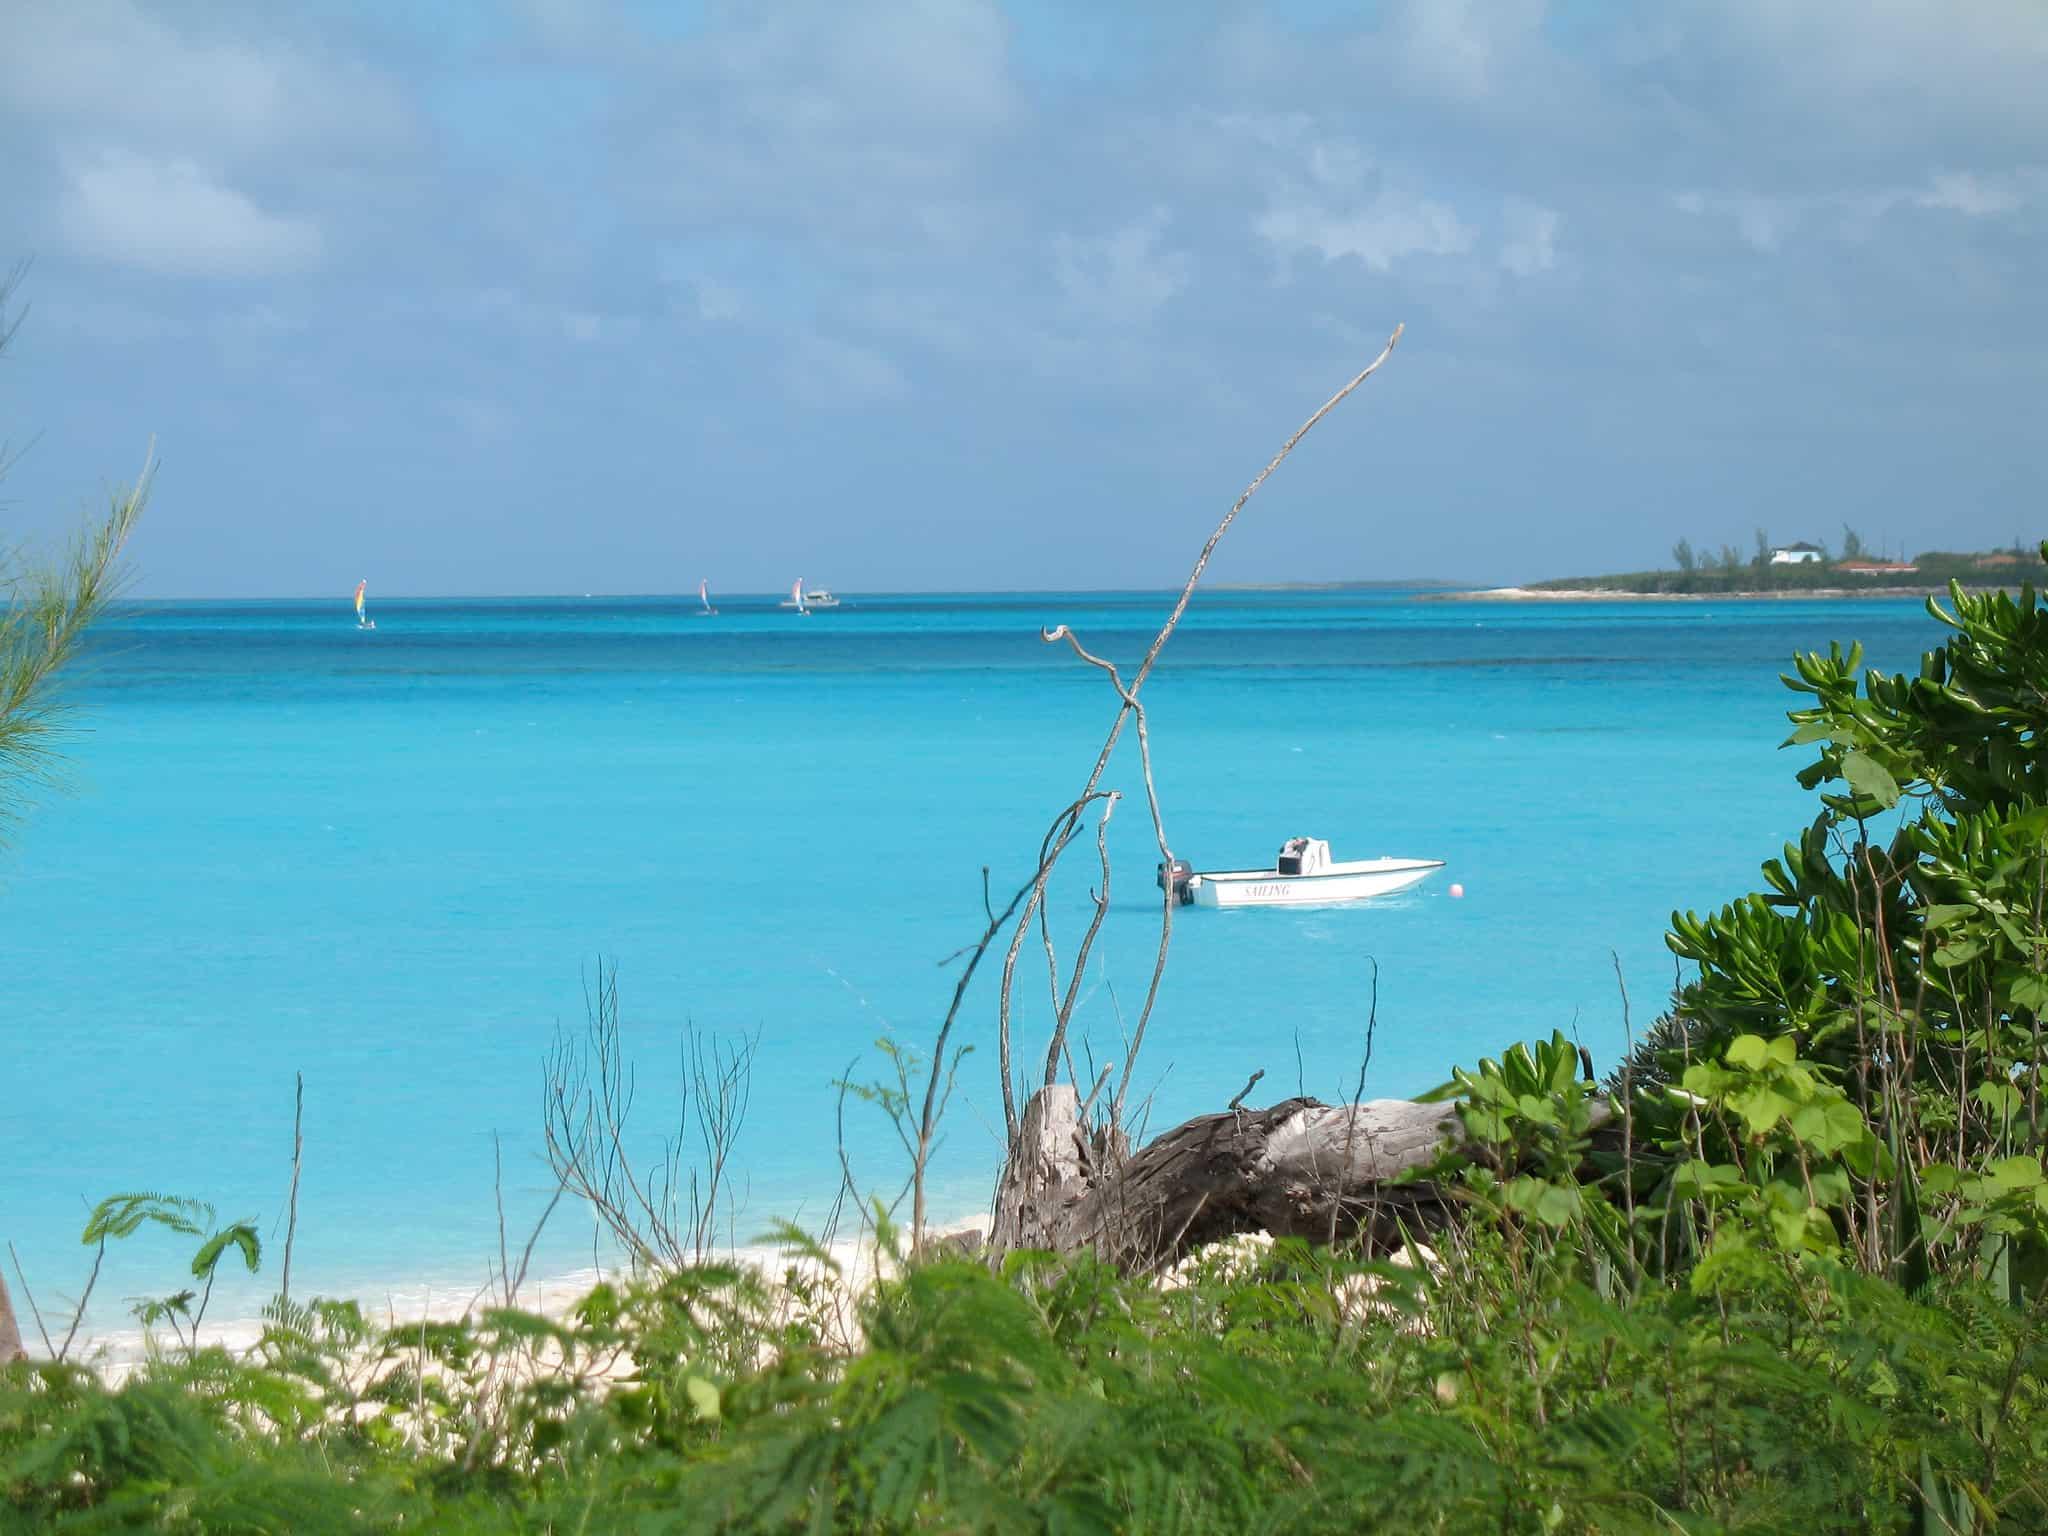 san salvador island bahamas flickr